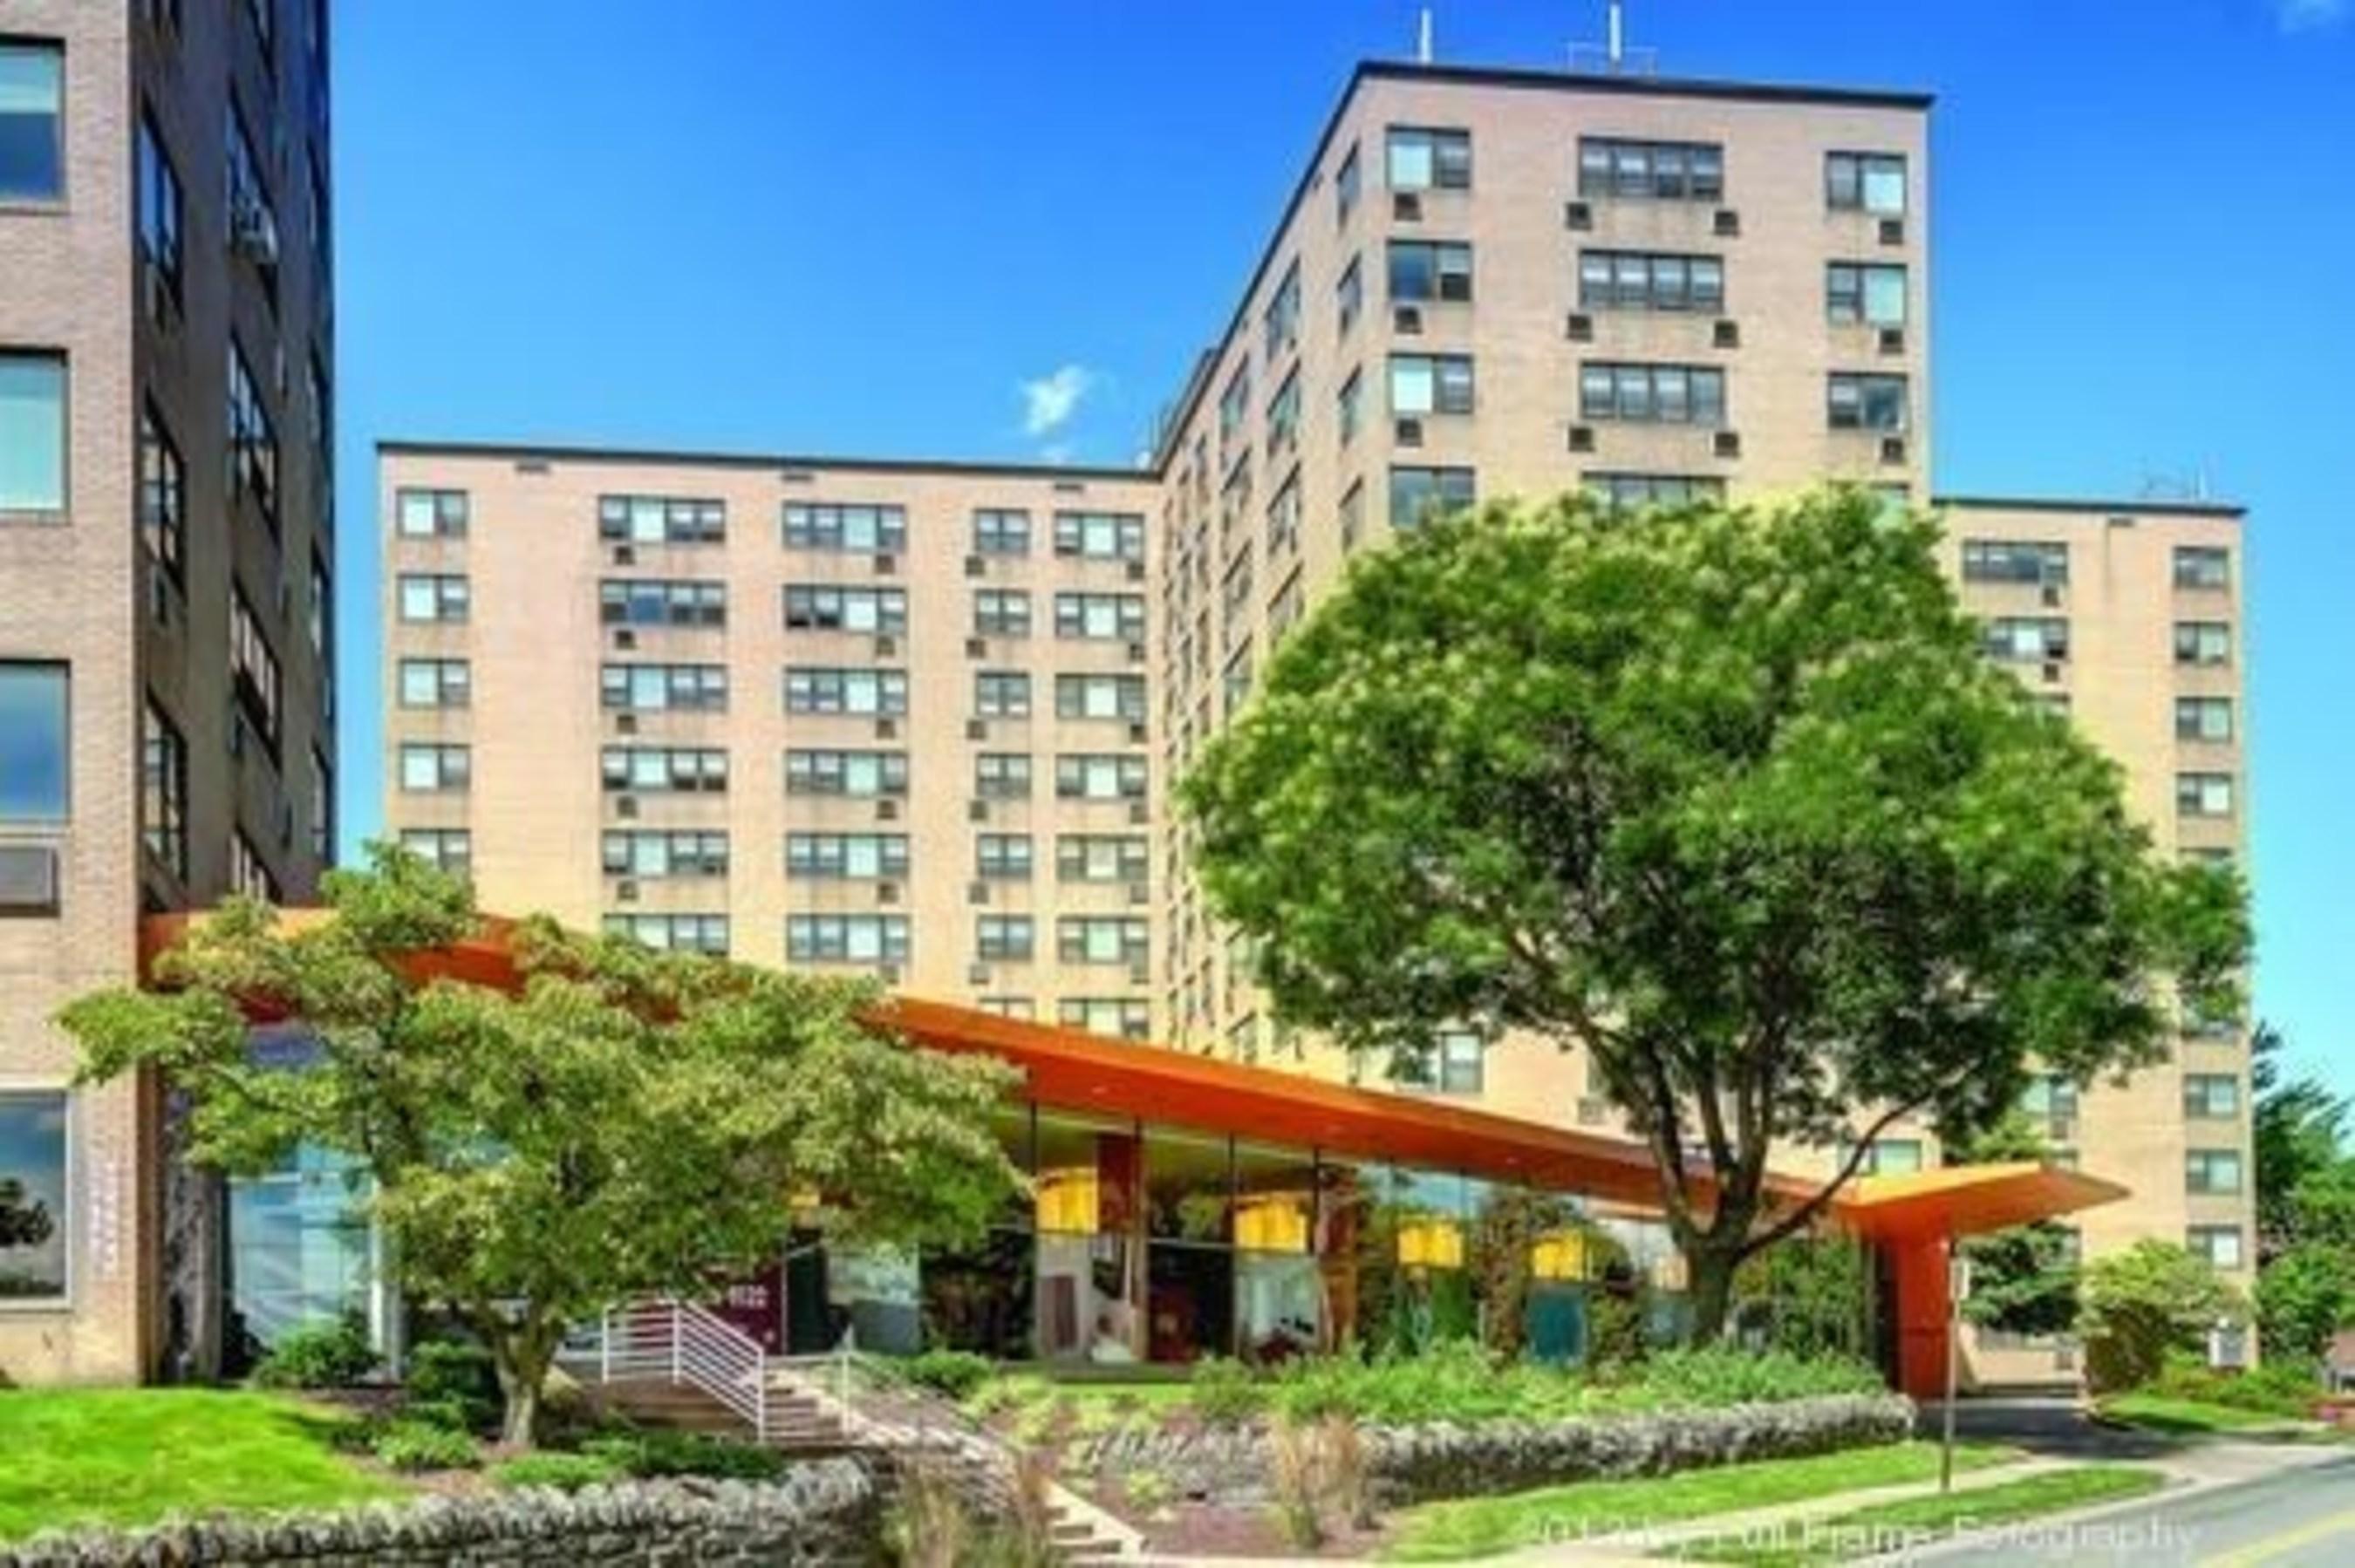 GoldOller Acquires 500 Unit Charter Court Apartments